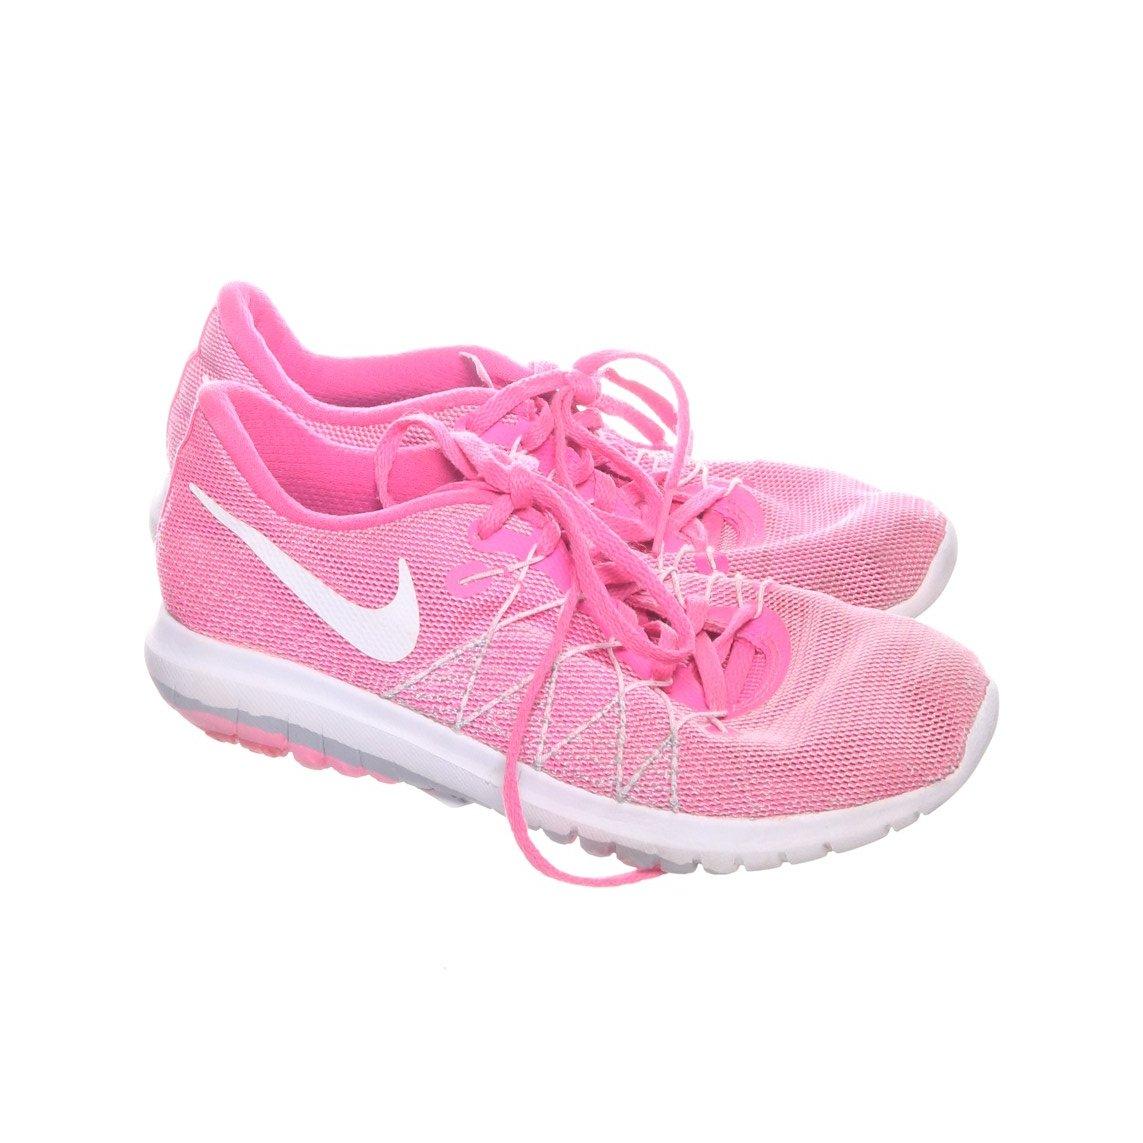 buy popular 66bbe efce7 Nike, Träningsskor, Strl  36, Flex Fury 2, Rosa